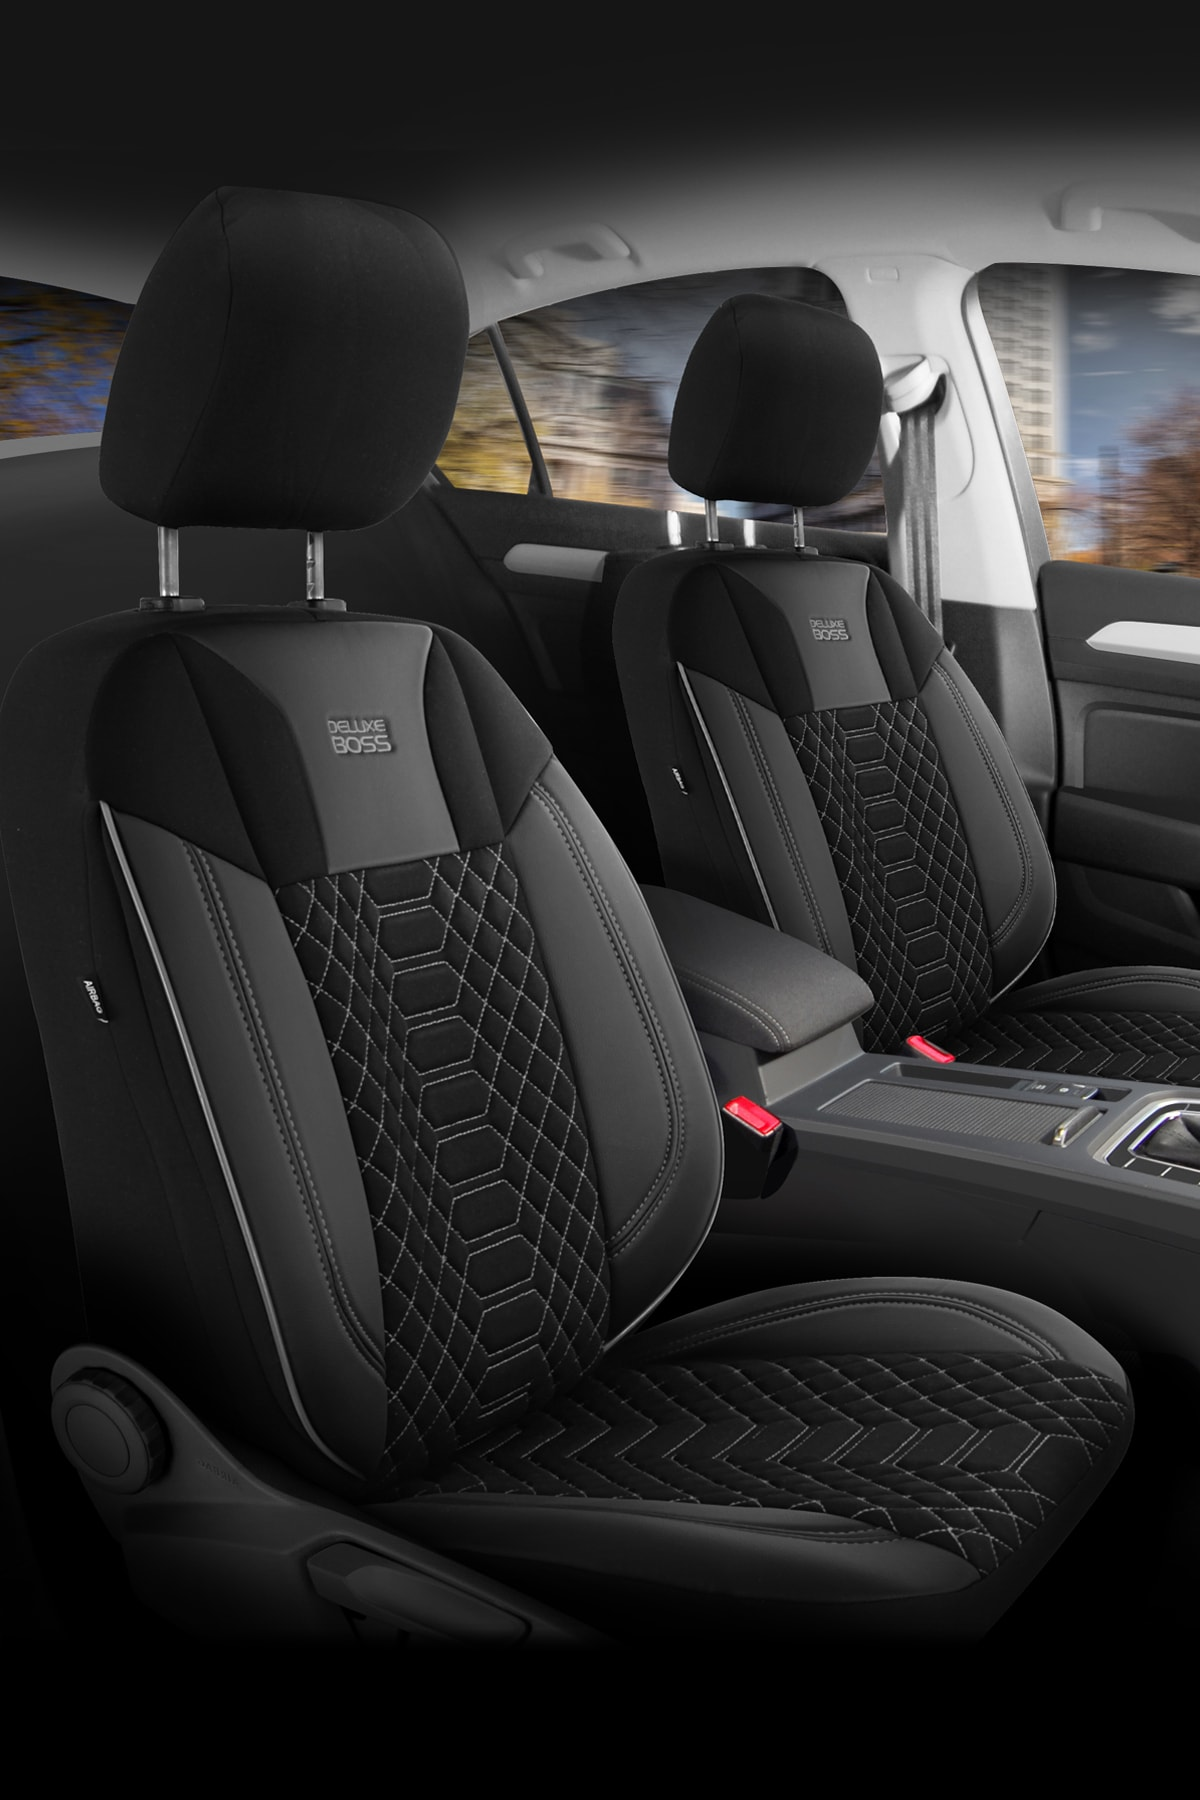 Deluxe Boss Special Oto Koltuk Kılıfı - Modena Serisi - Siyah Renk Füme Nakış 2